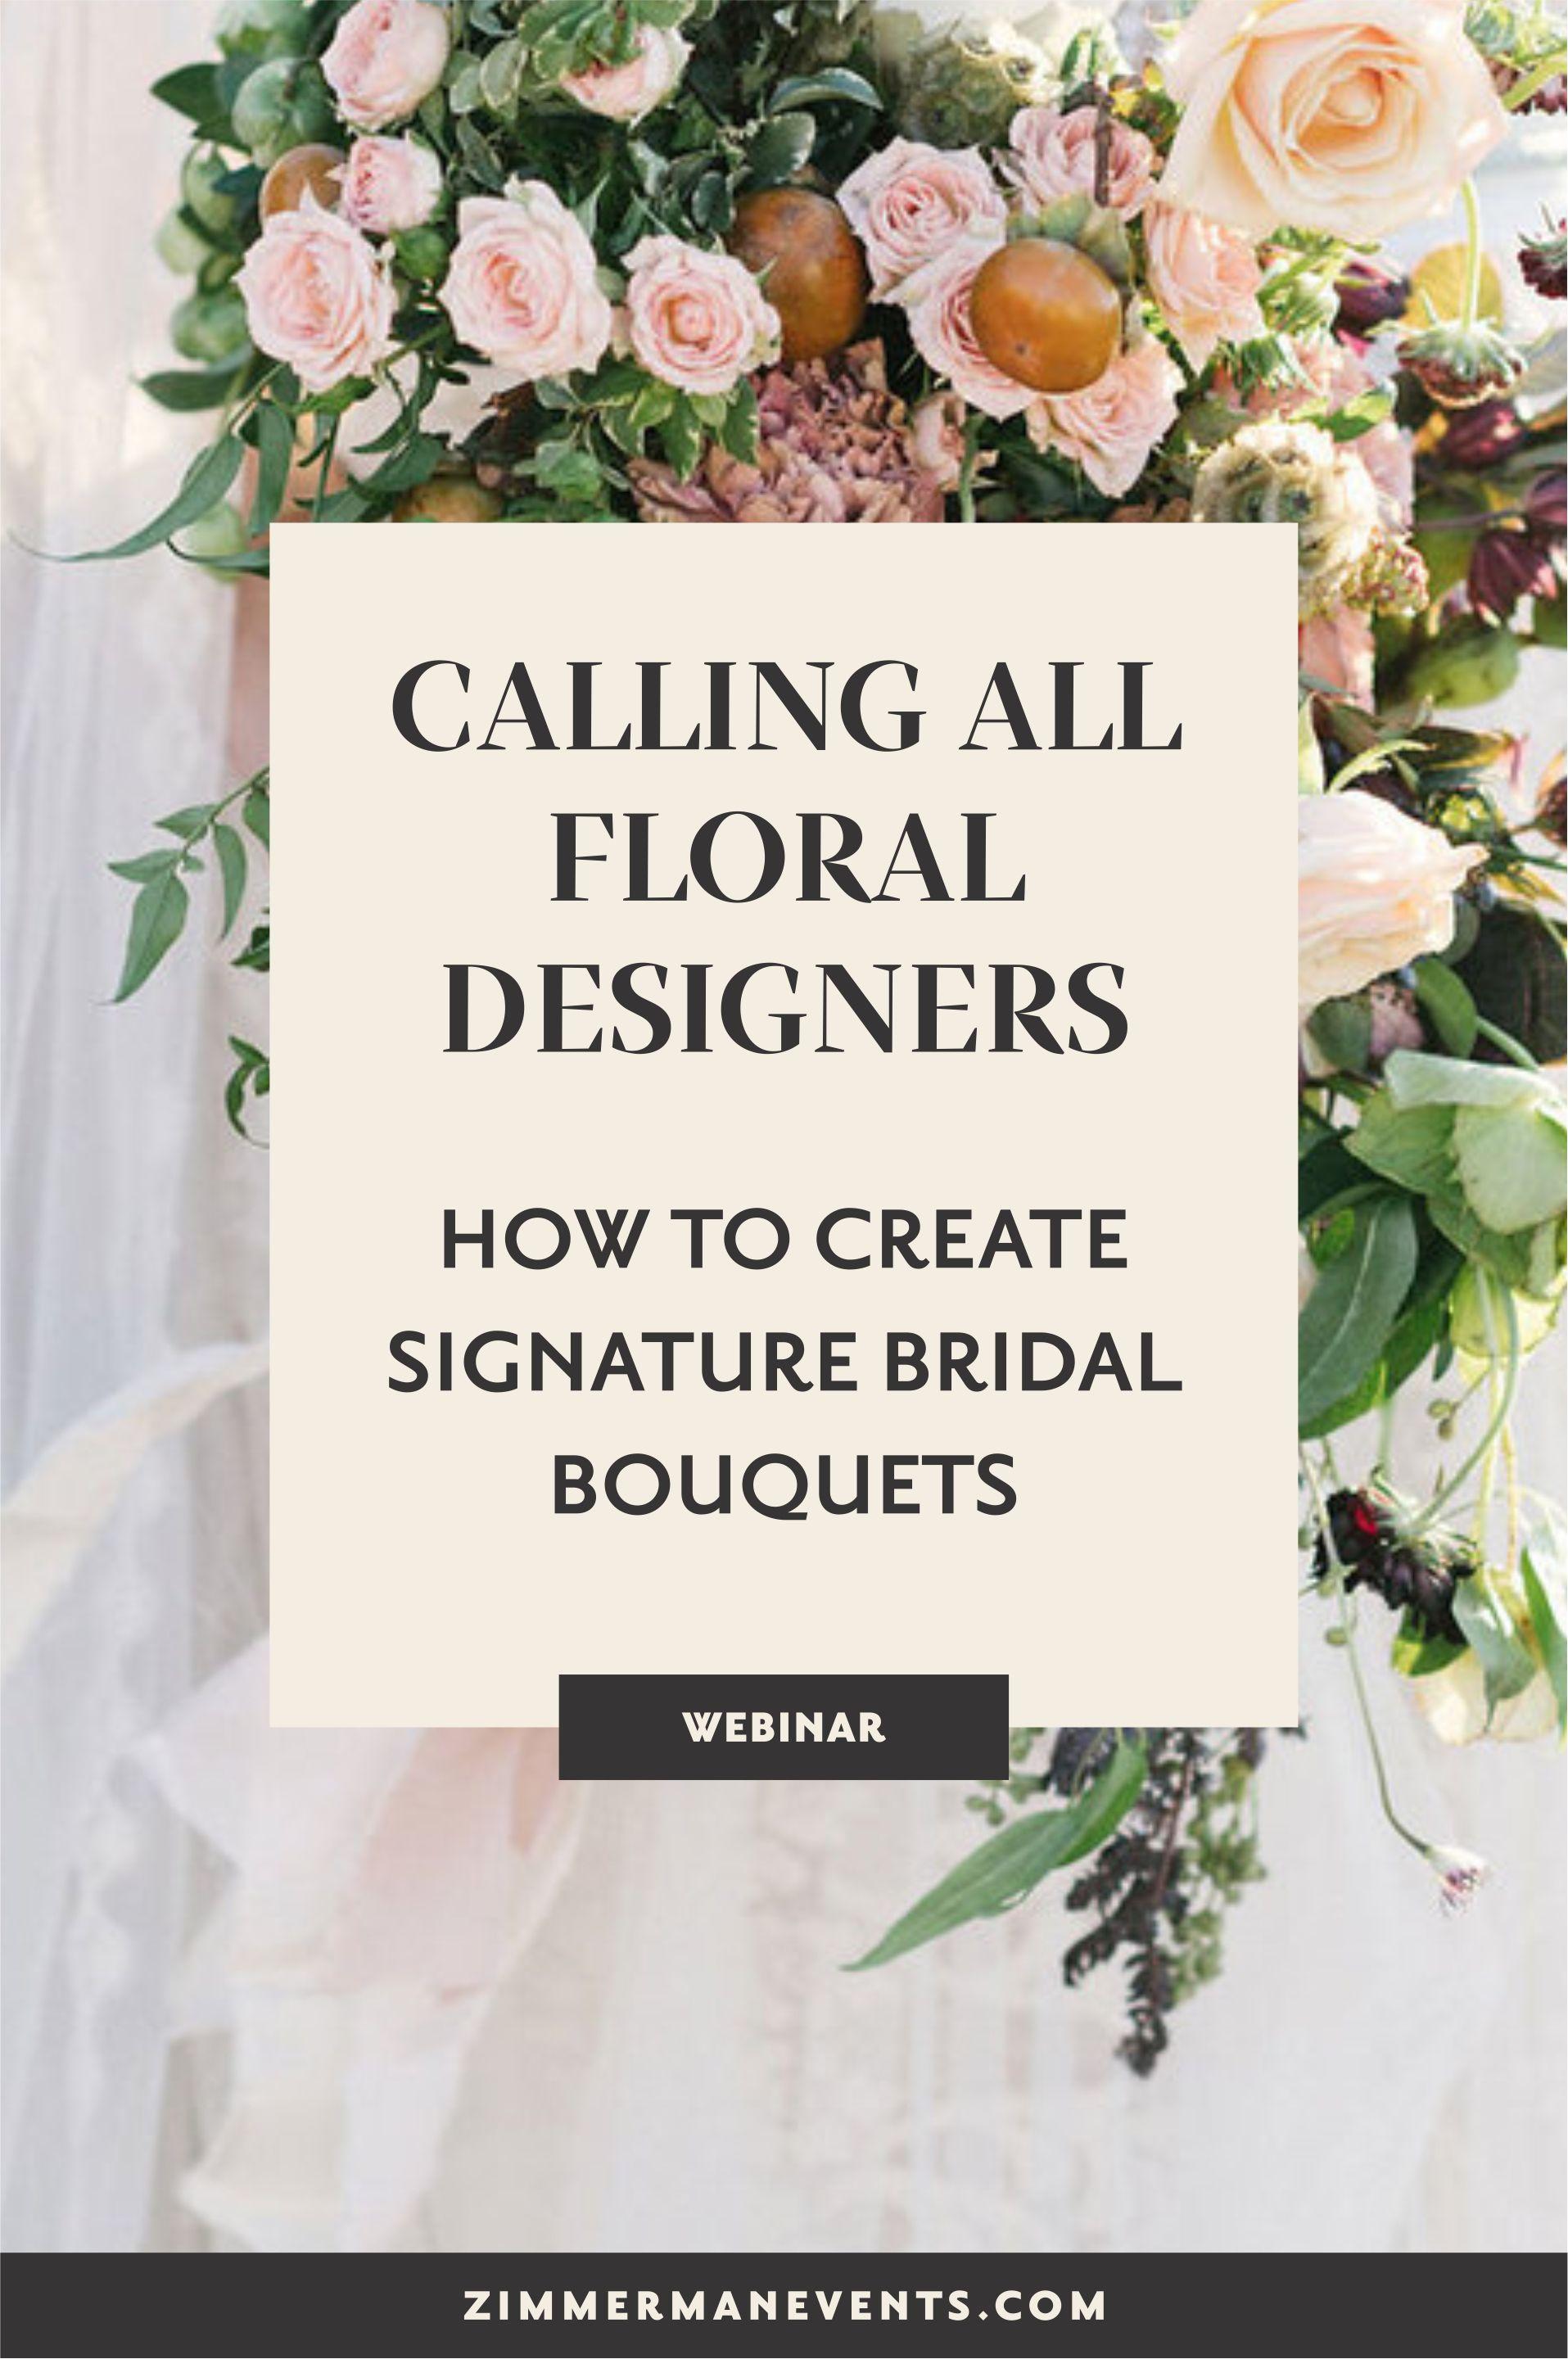 Video Tutorial Signature Bridal Bouquet Arkansas Wedding Planner Florist Education Zimmerman Wedding Business Ideas Bridal Bouquet Wedding Business